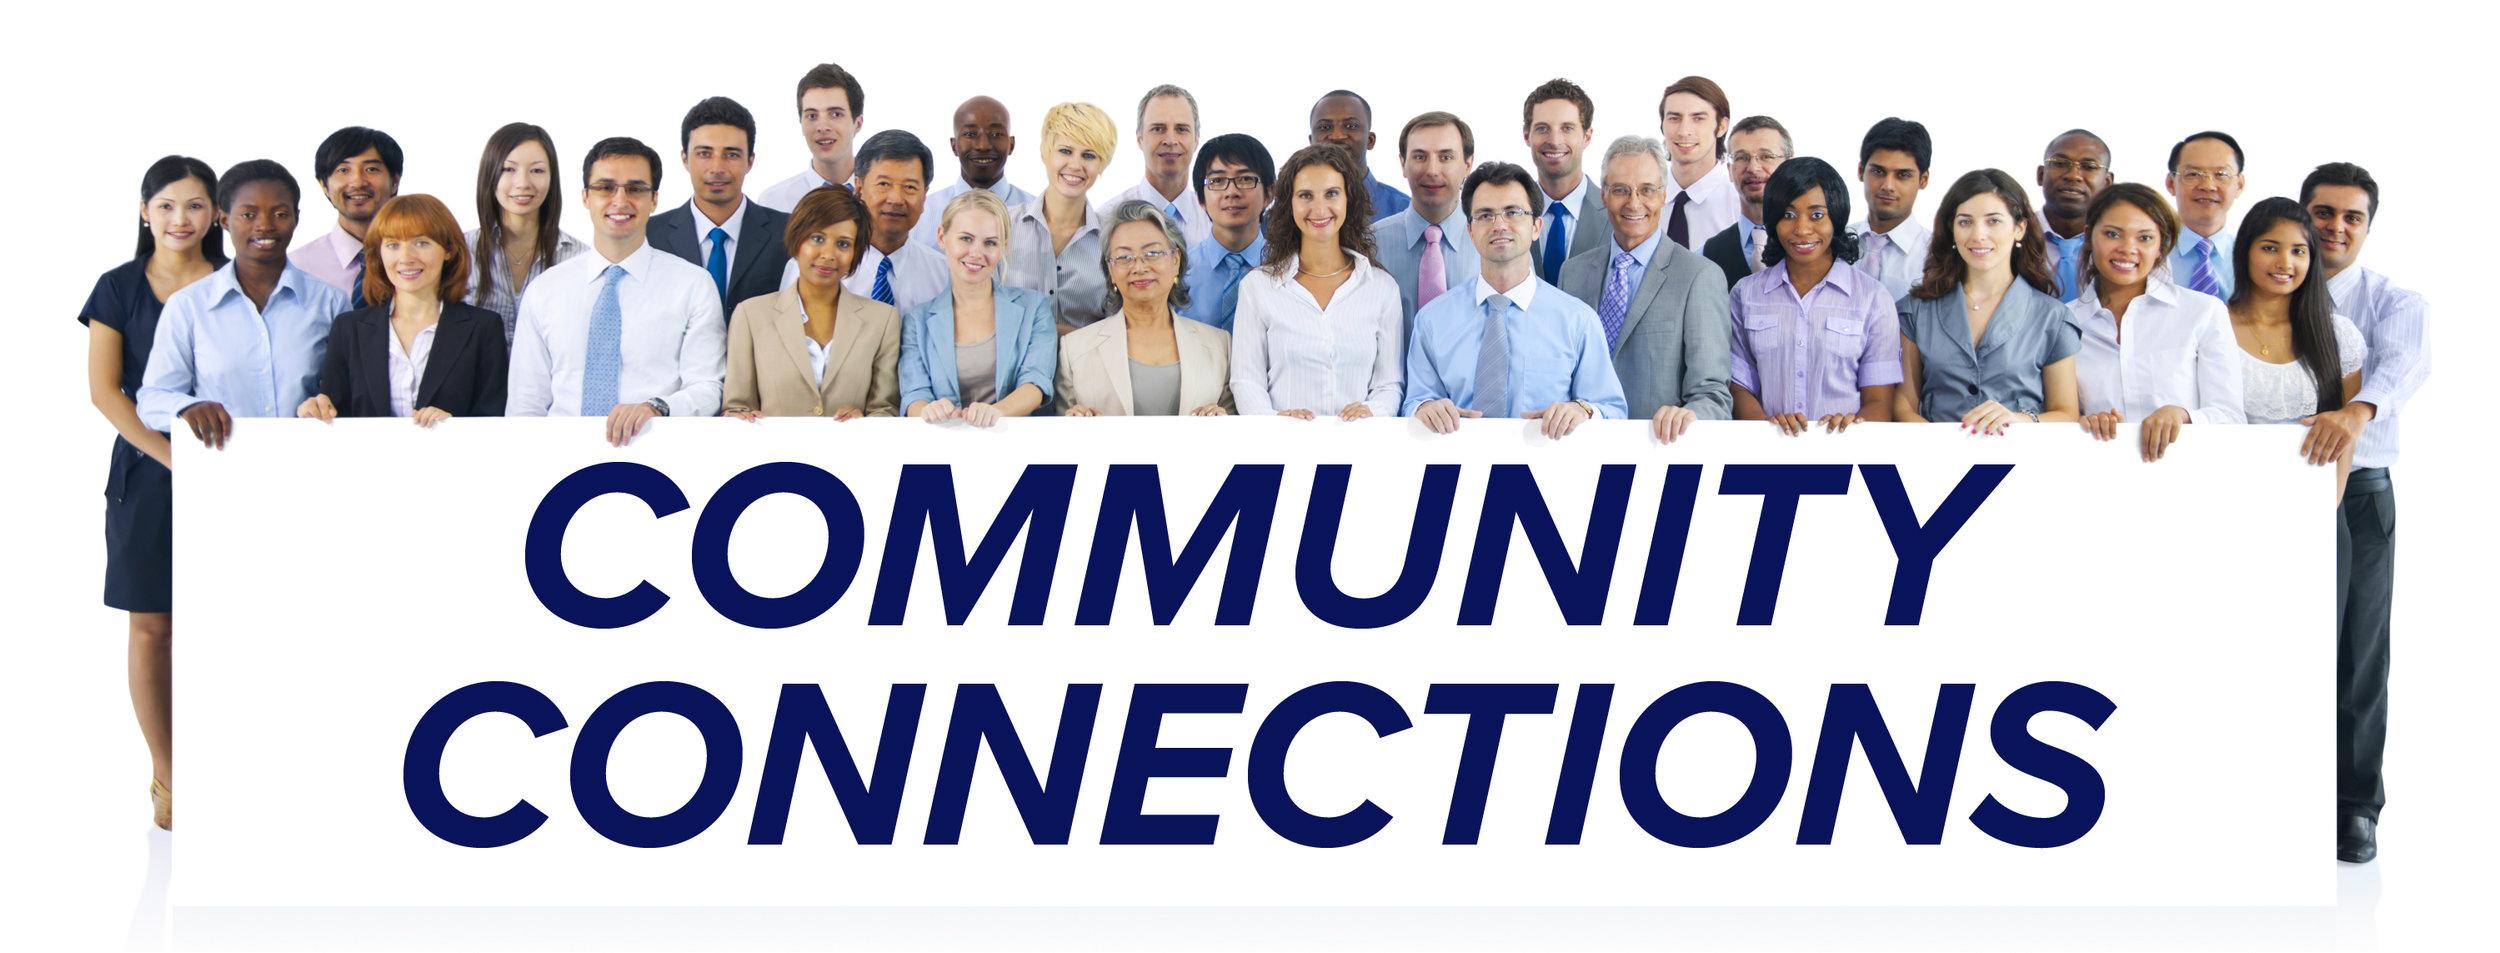 COMMUNITYCONNECTIONS_BANNER.jpg